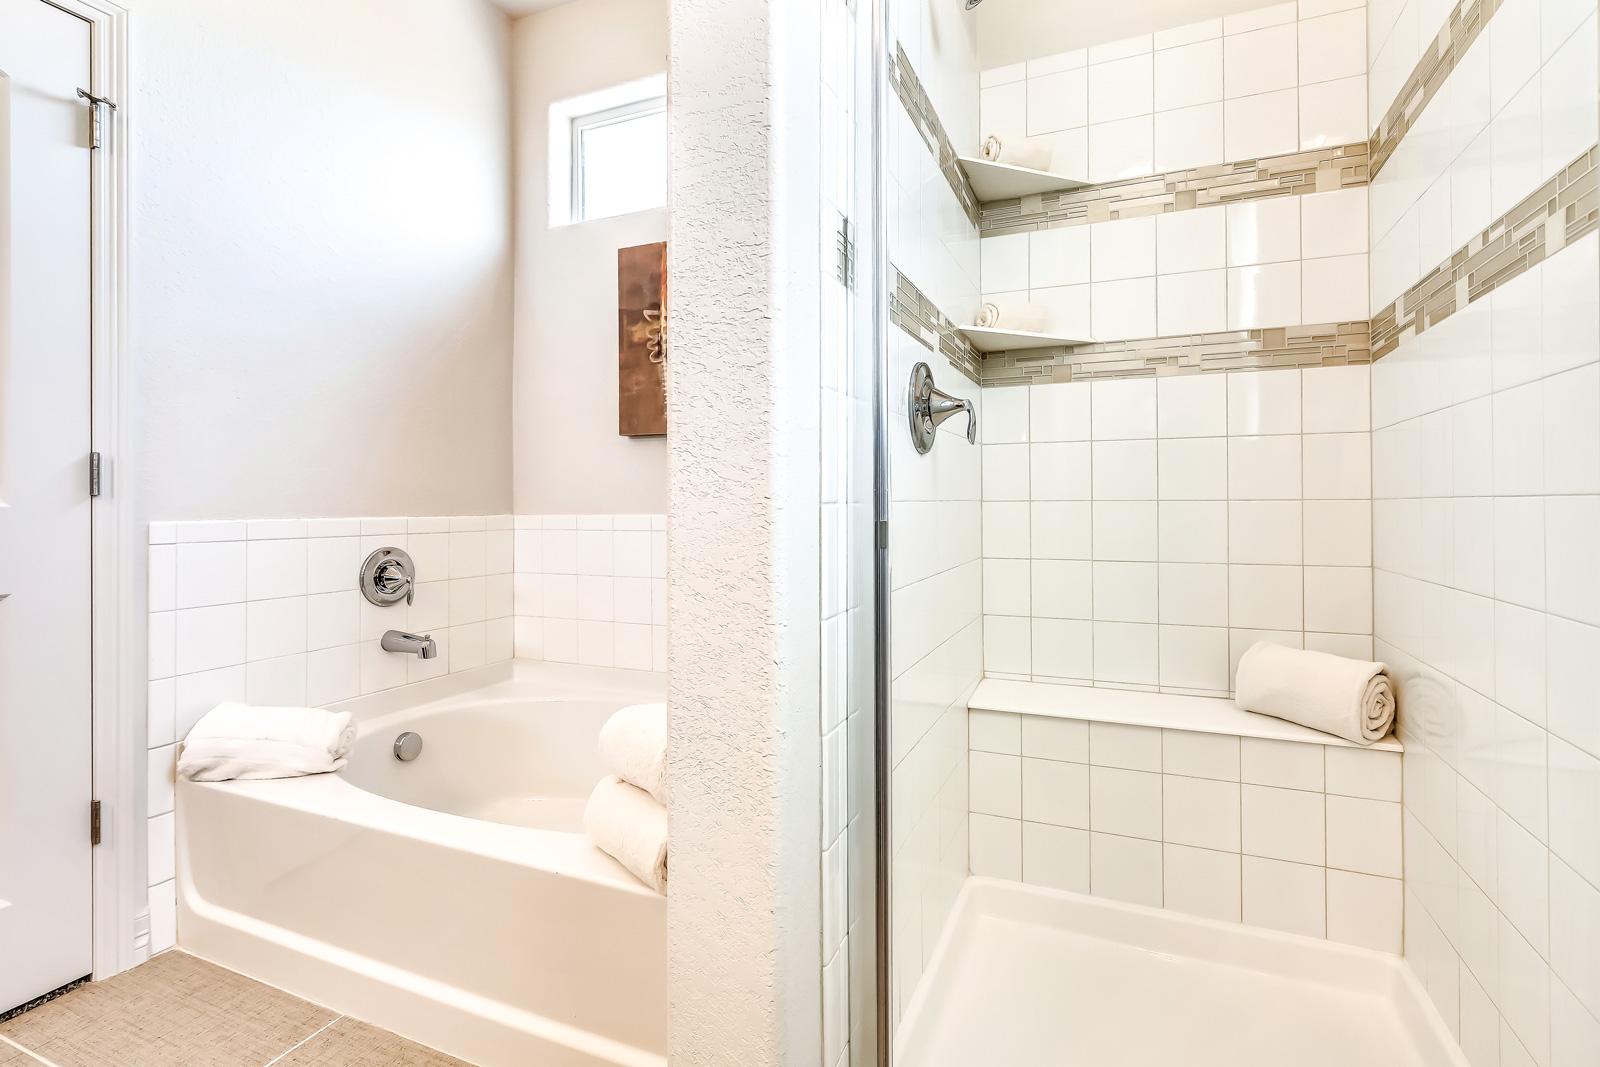 Bath with premium finishes